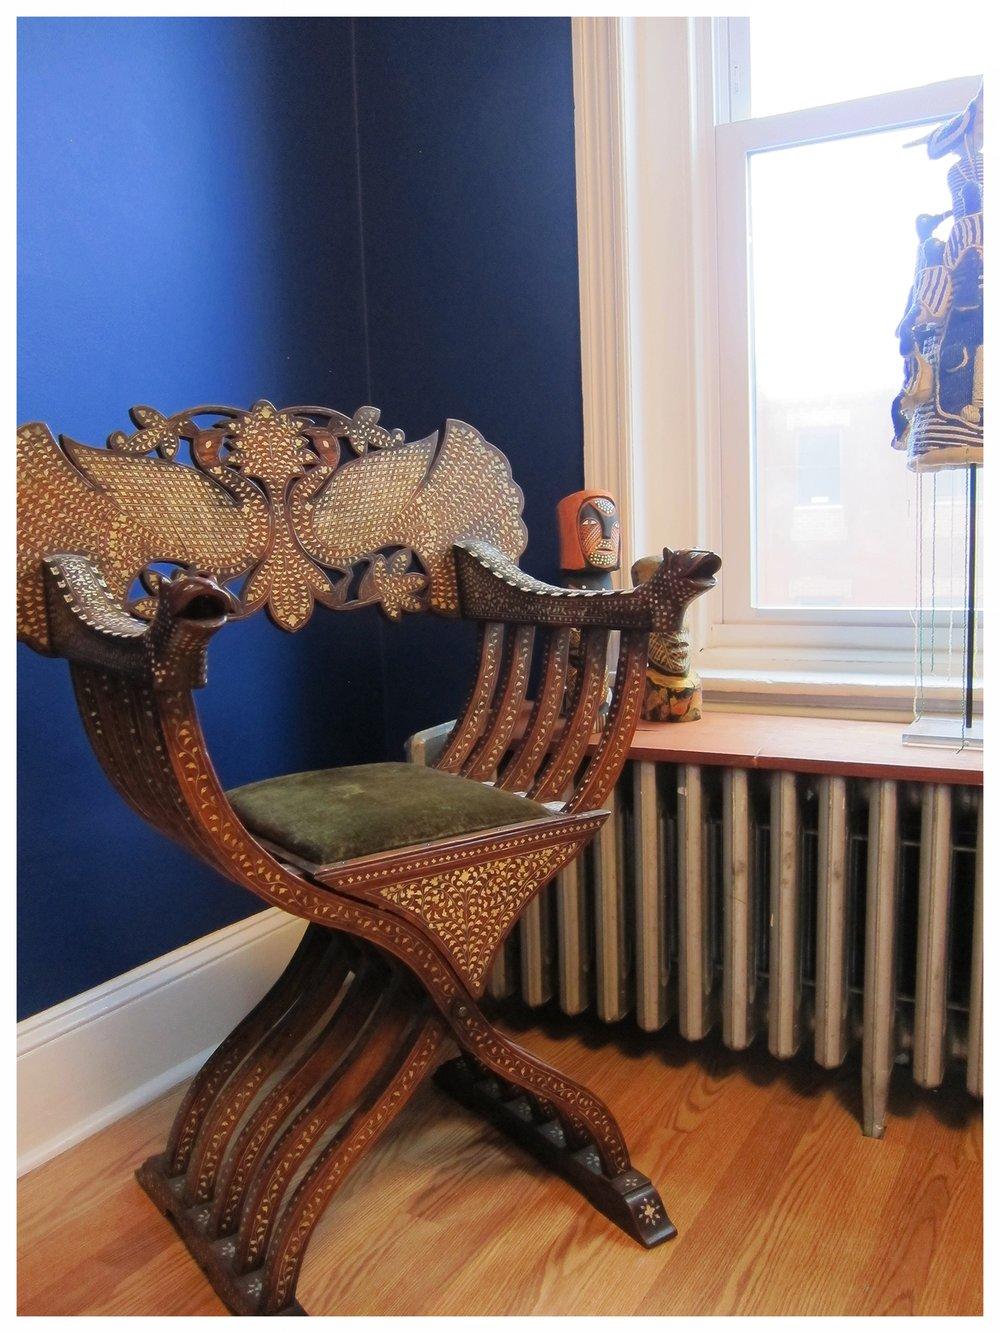 Top Floor Chair.jpg